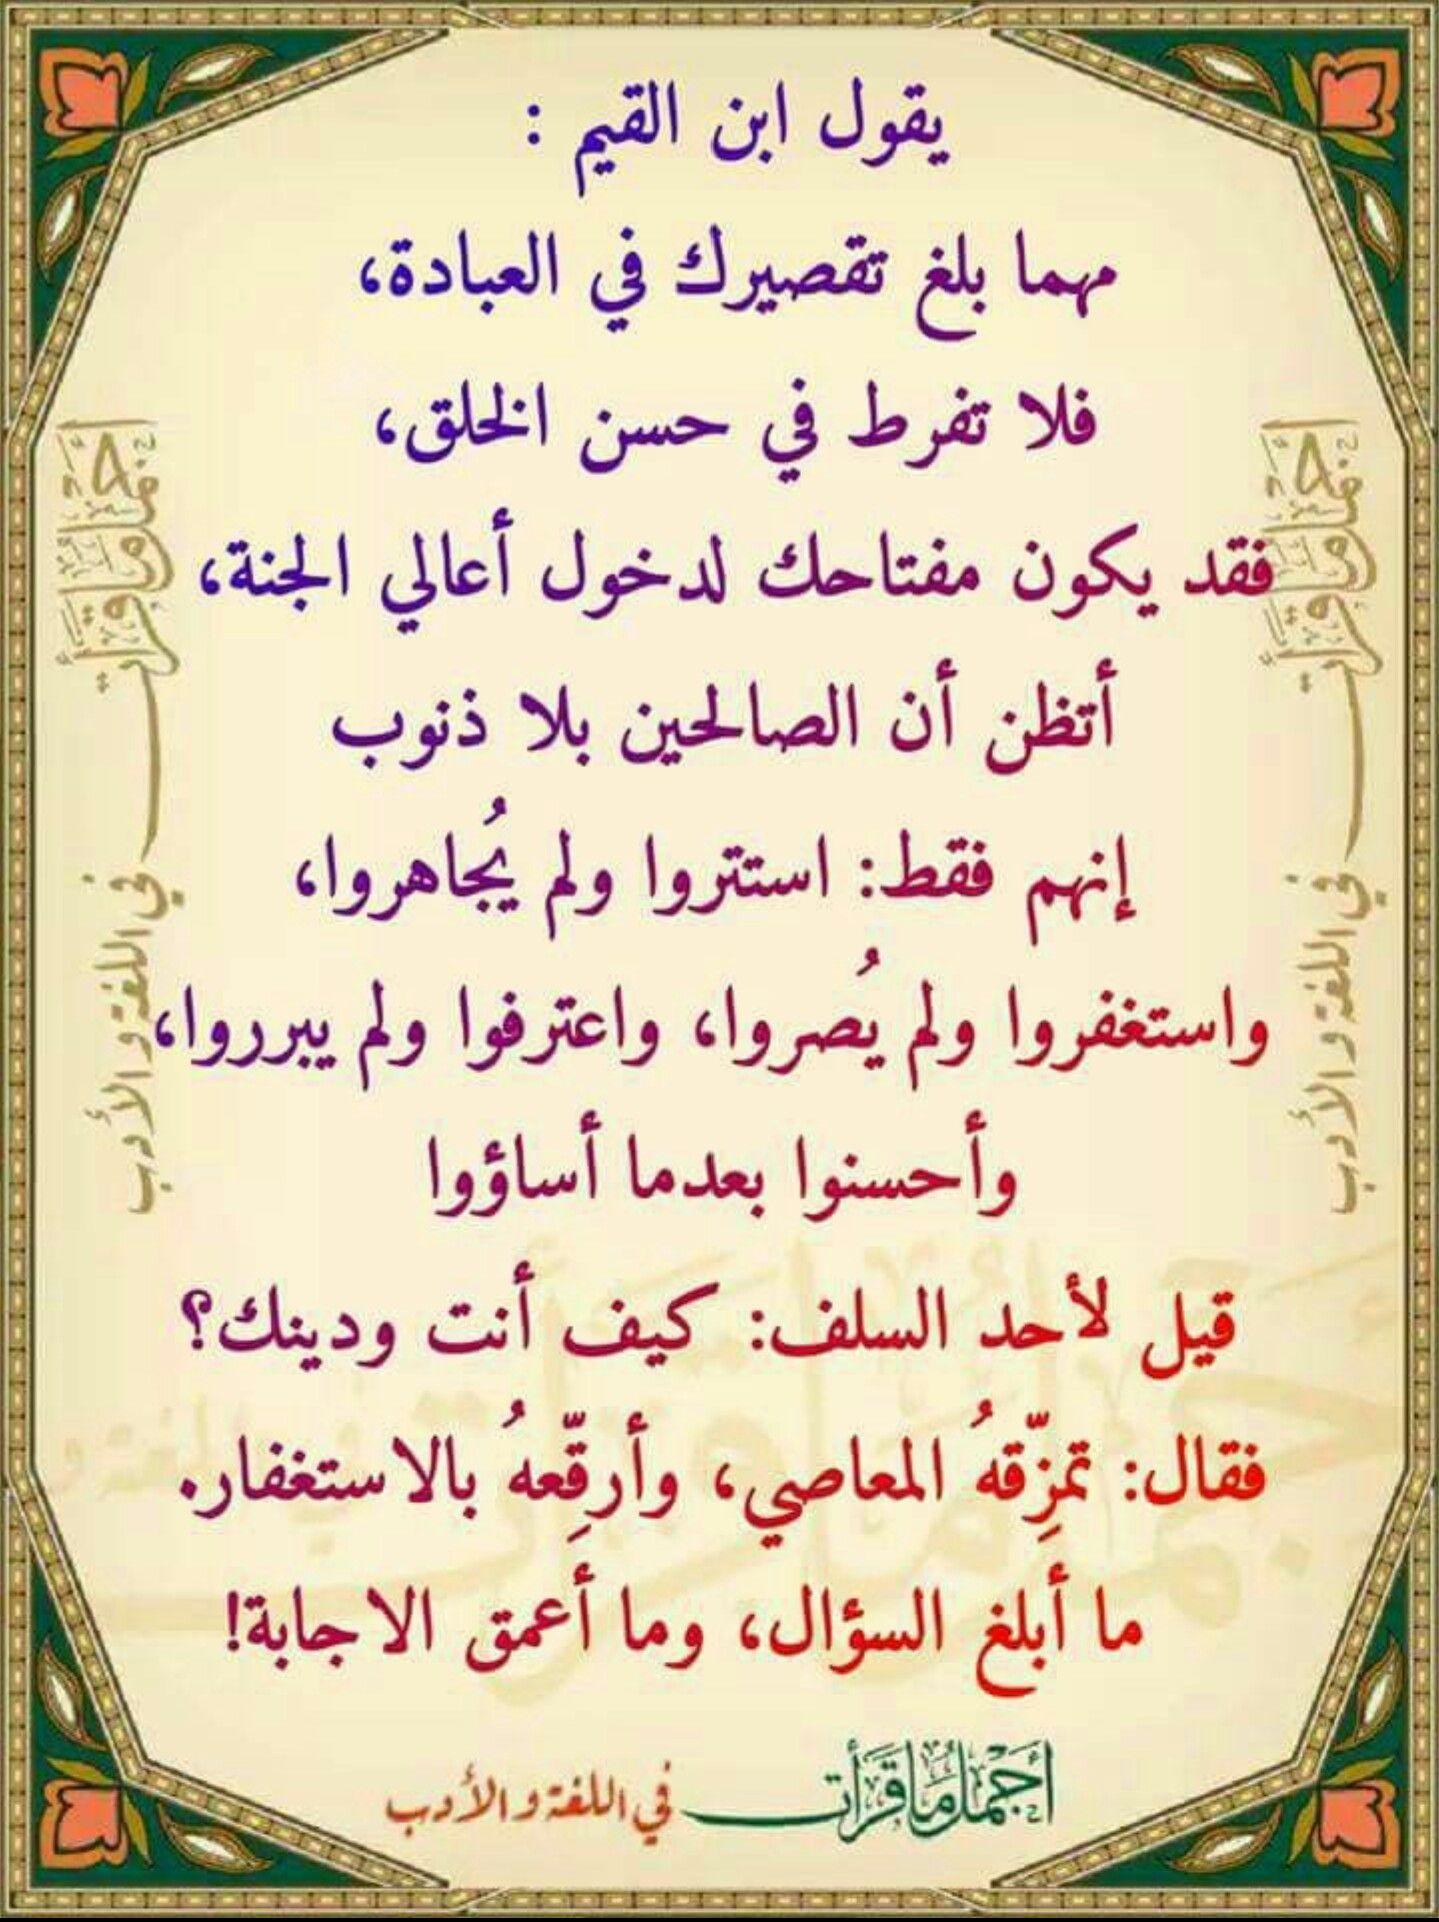 الإستغفار Islamic Phrases Islamic Messages Cute Love Wallpapers